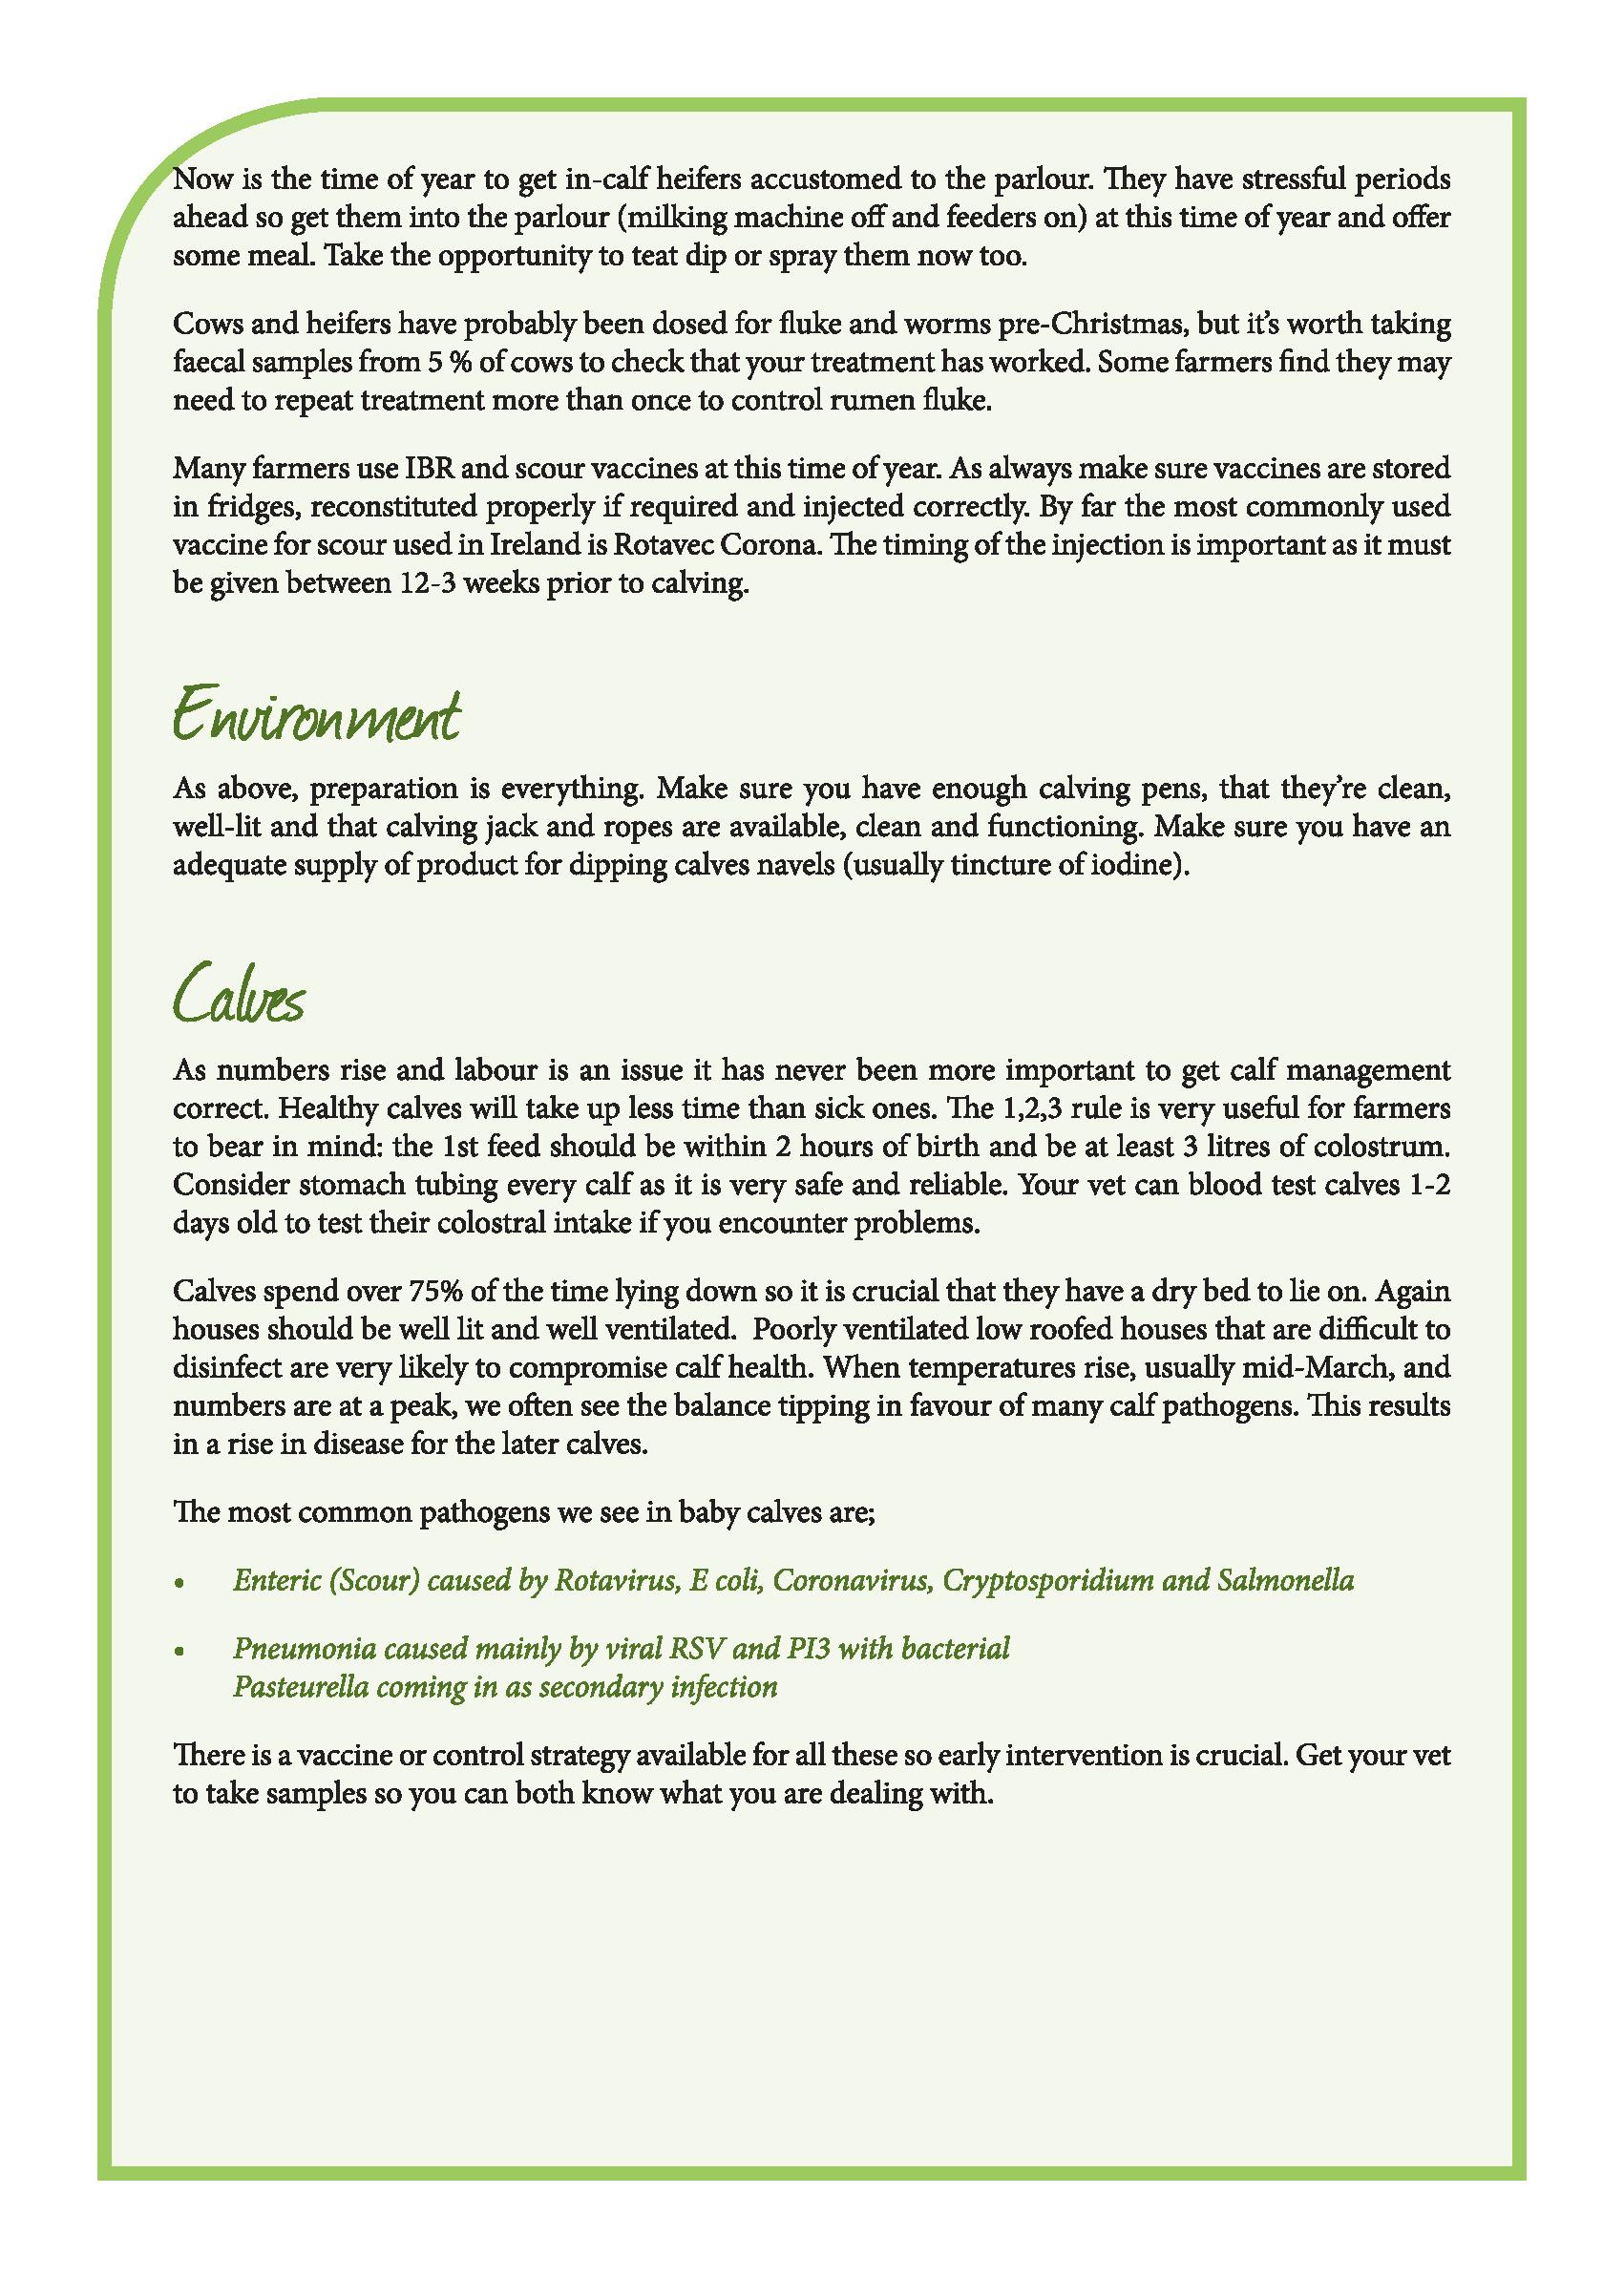 print_duntahane_issue 20 dec 15 newsletter_Page_3